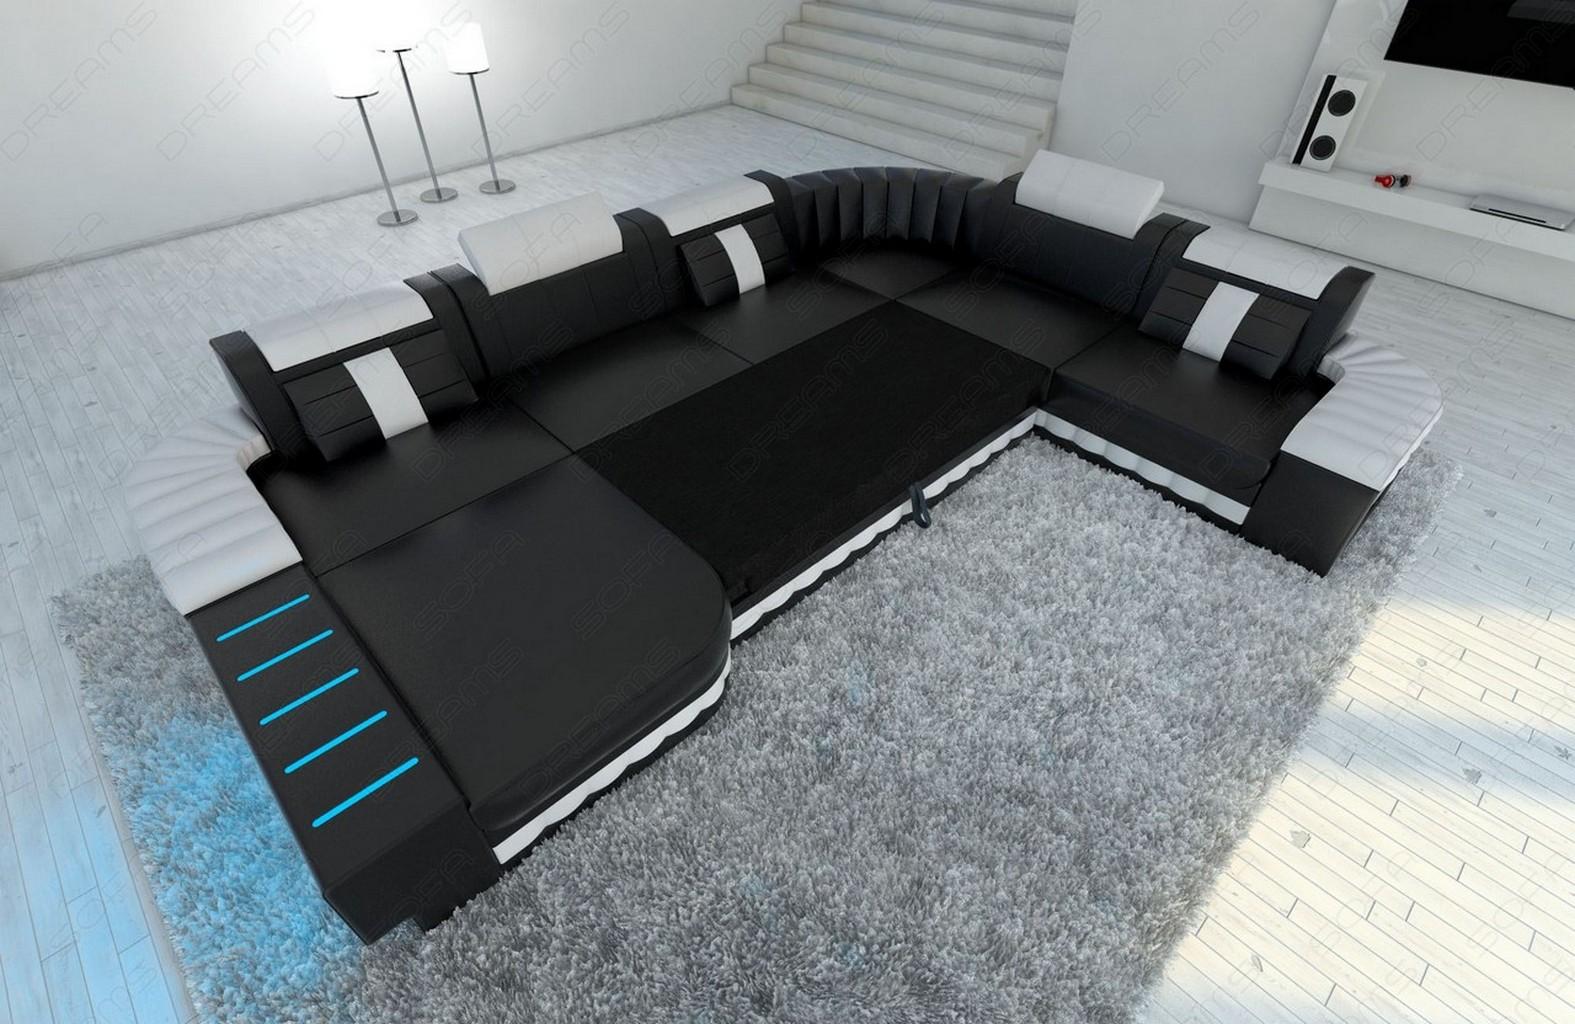 Luxus Ecksofa Design Ledercouch Wohnlandschaft Xxl Bellagio Sofa Led